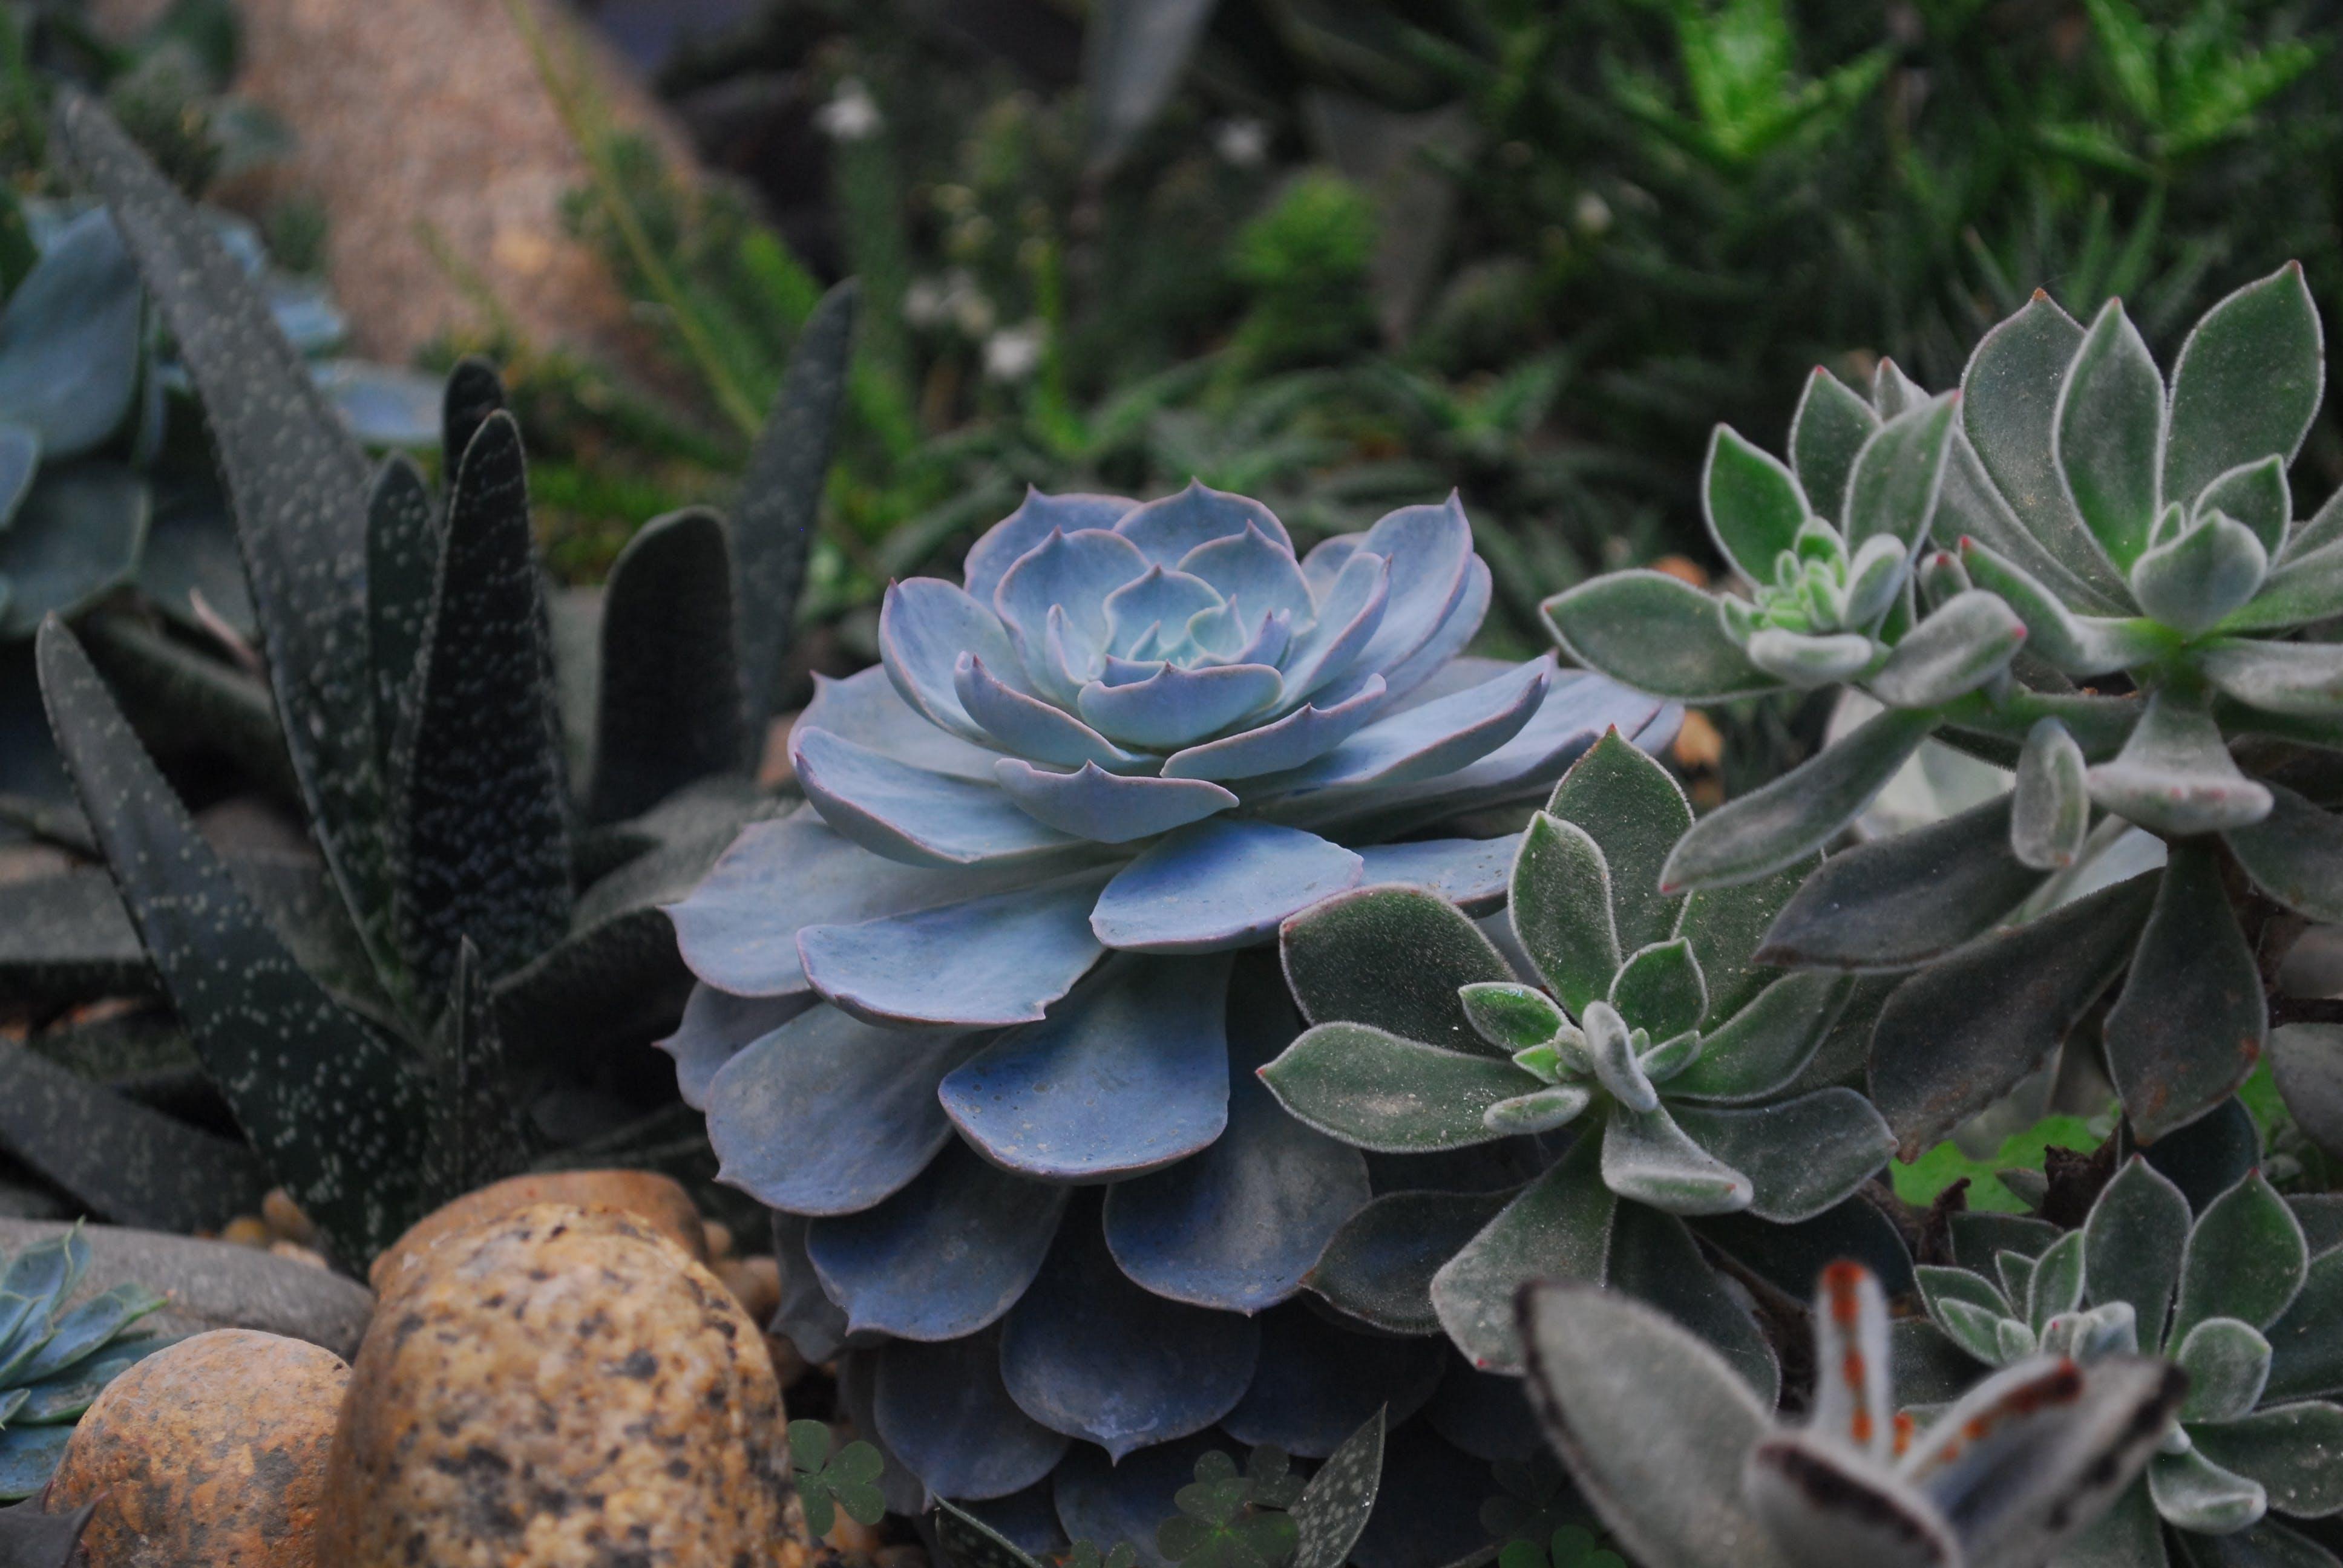 Echeveria Succulents and Panda Plant Closeup Photography